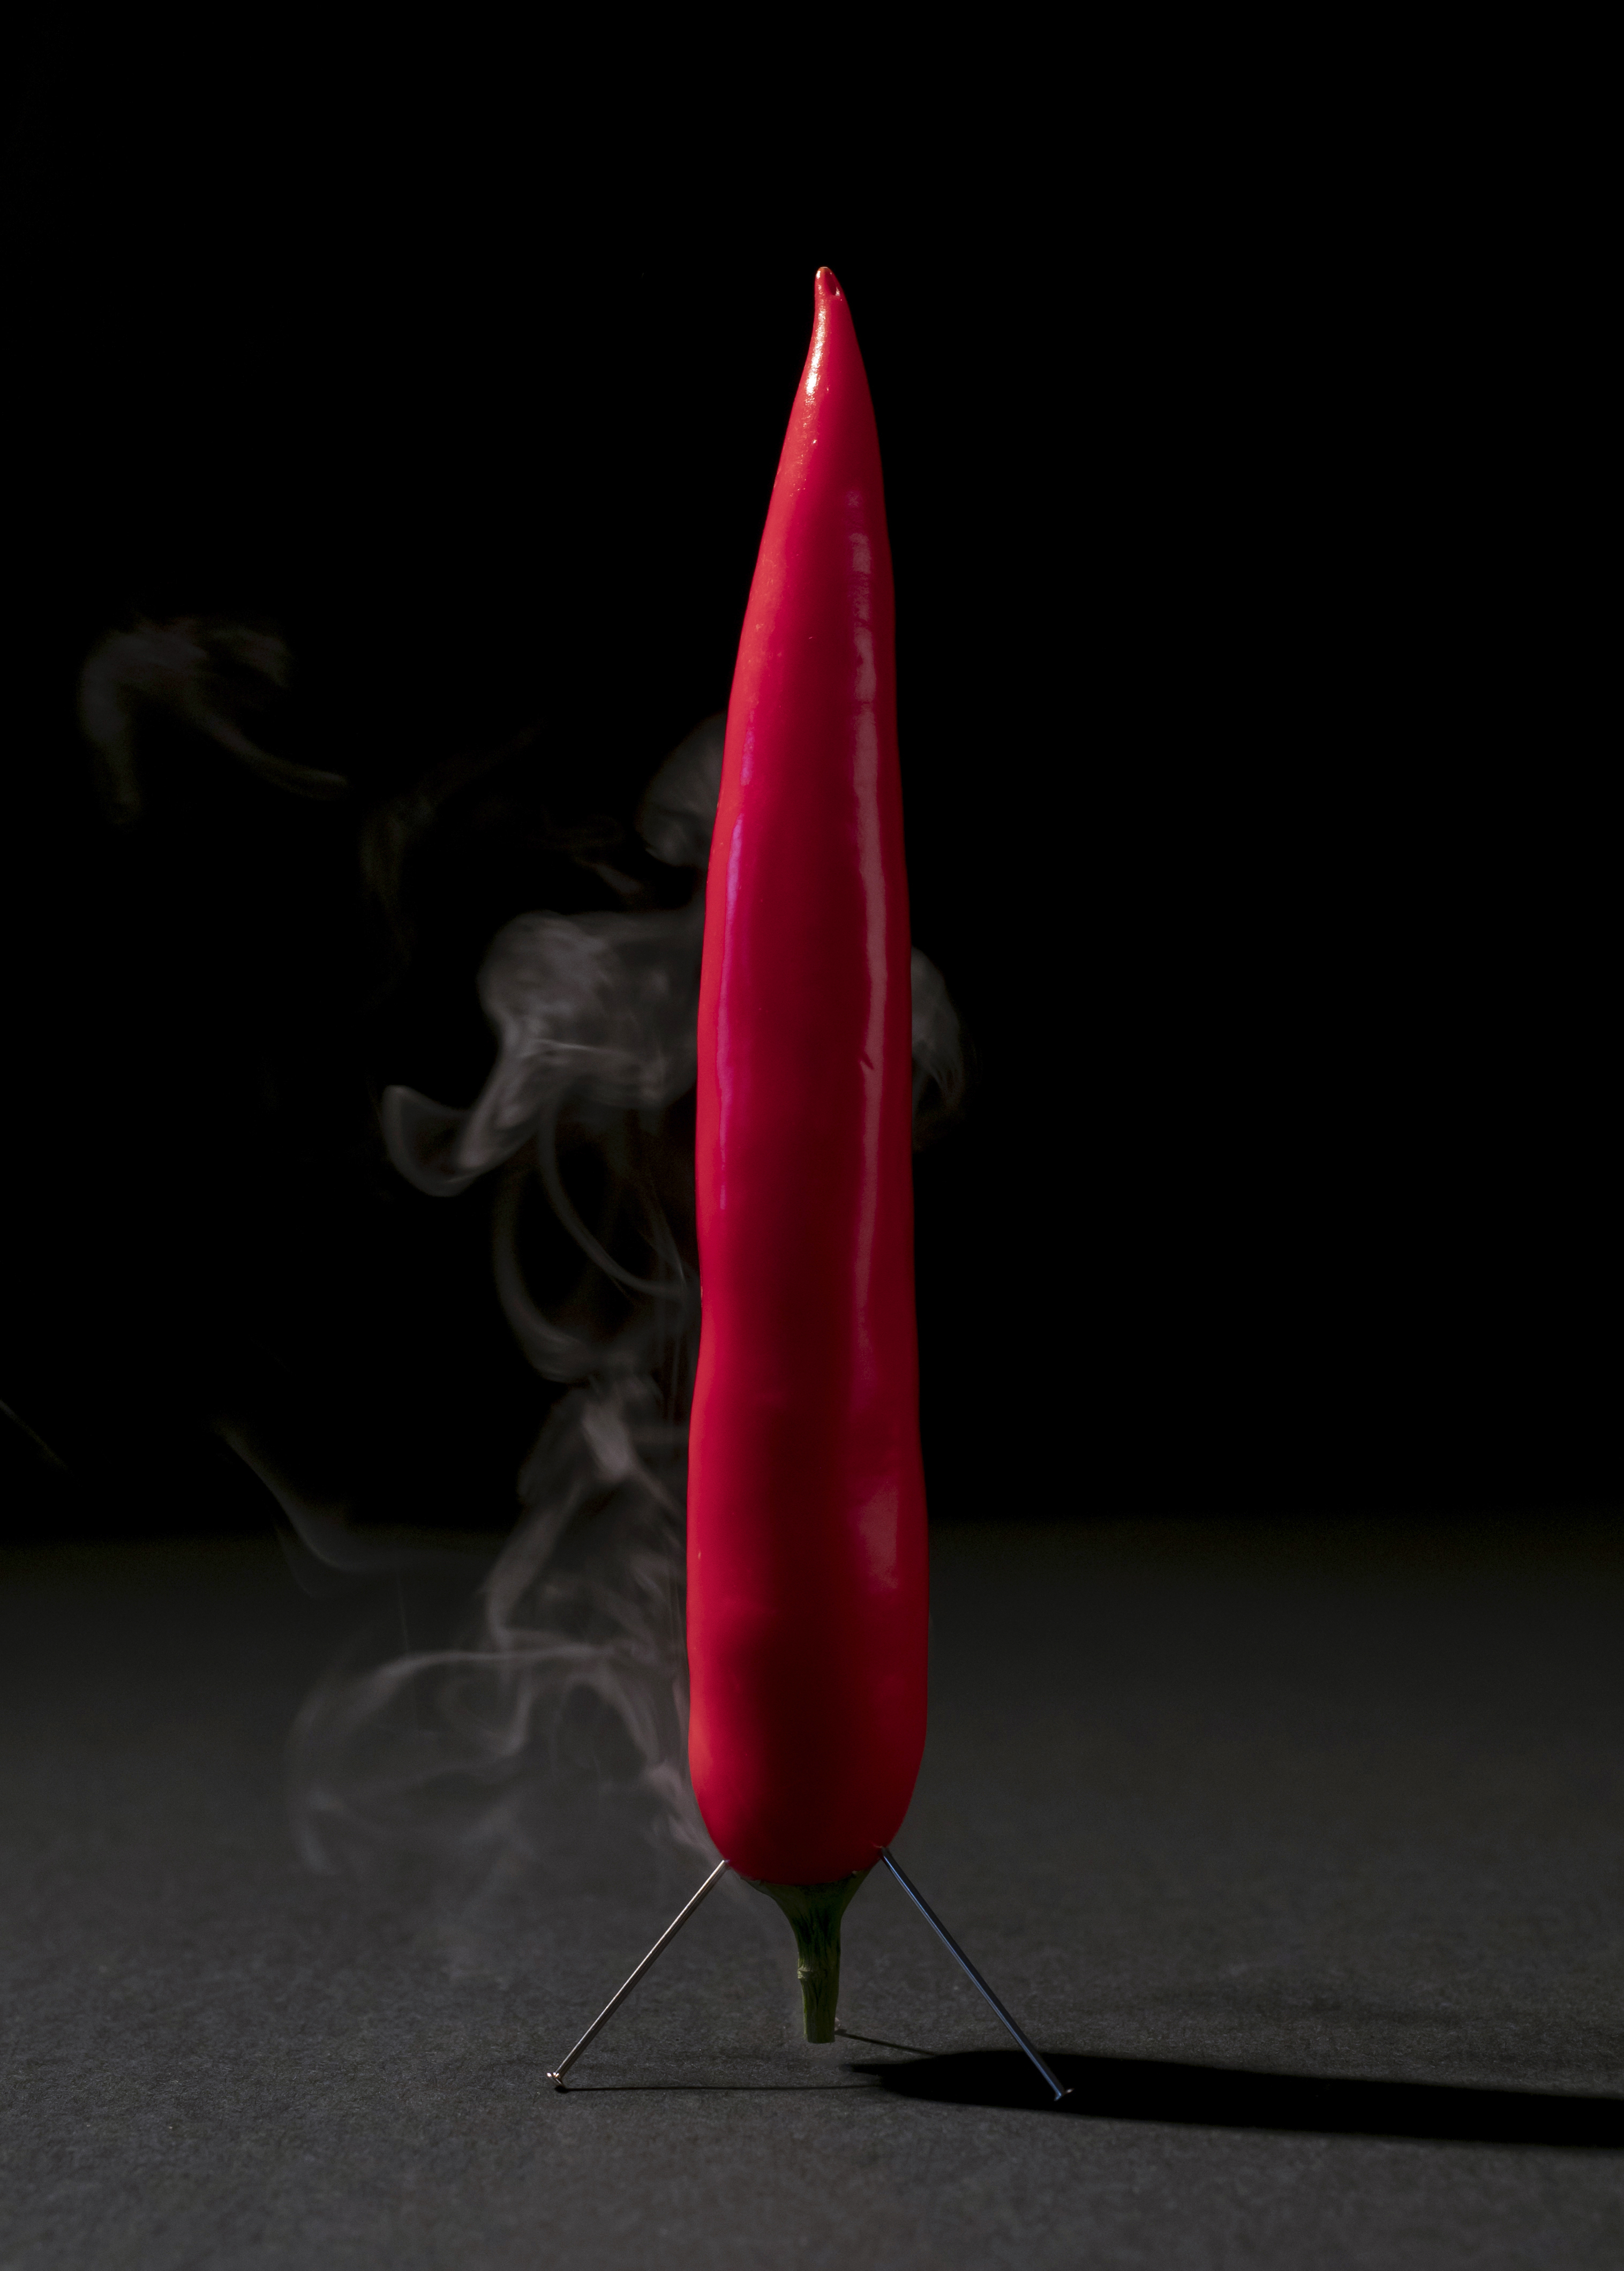 014 Raket peper rook-colorcorr